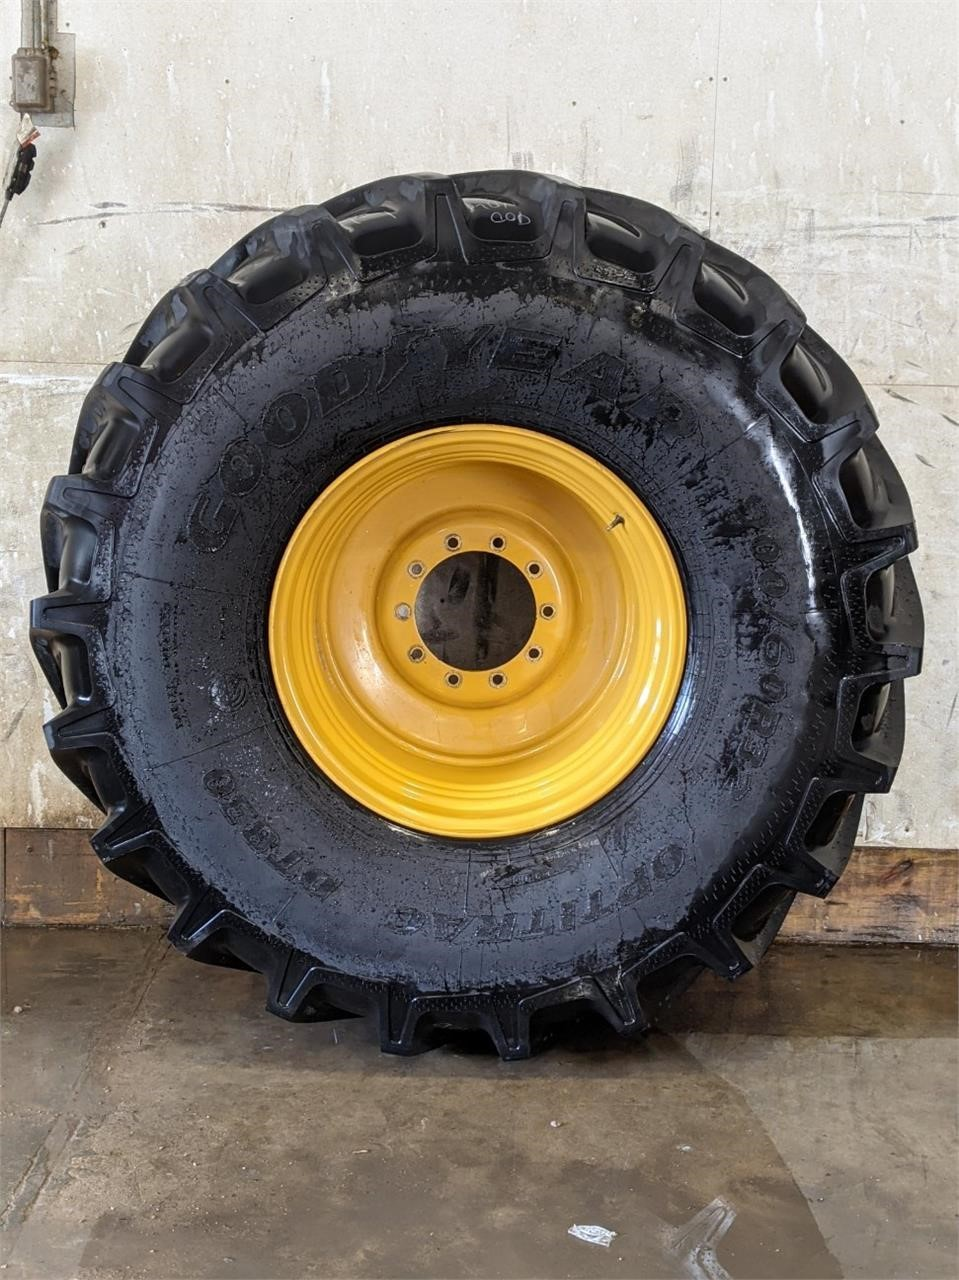 Goodyear 900/60R32 Wheels / Tires / Track